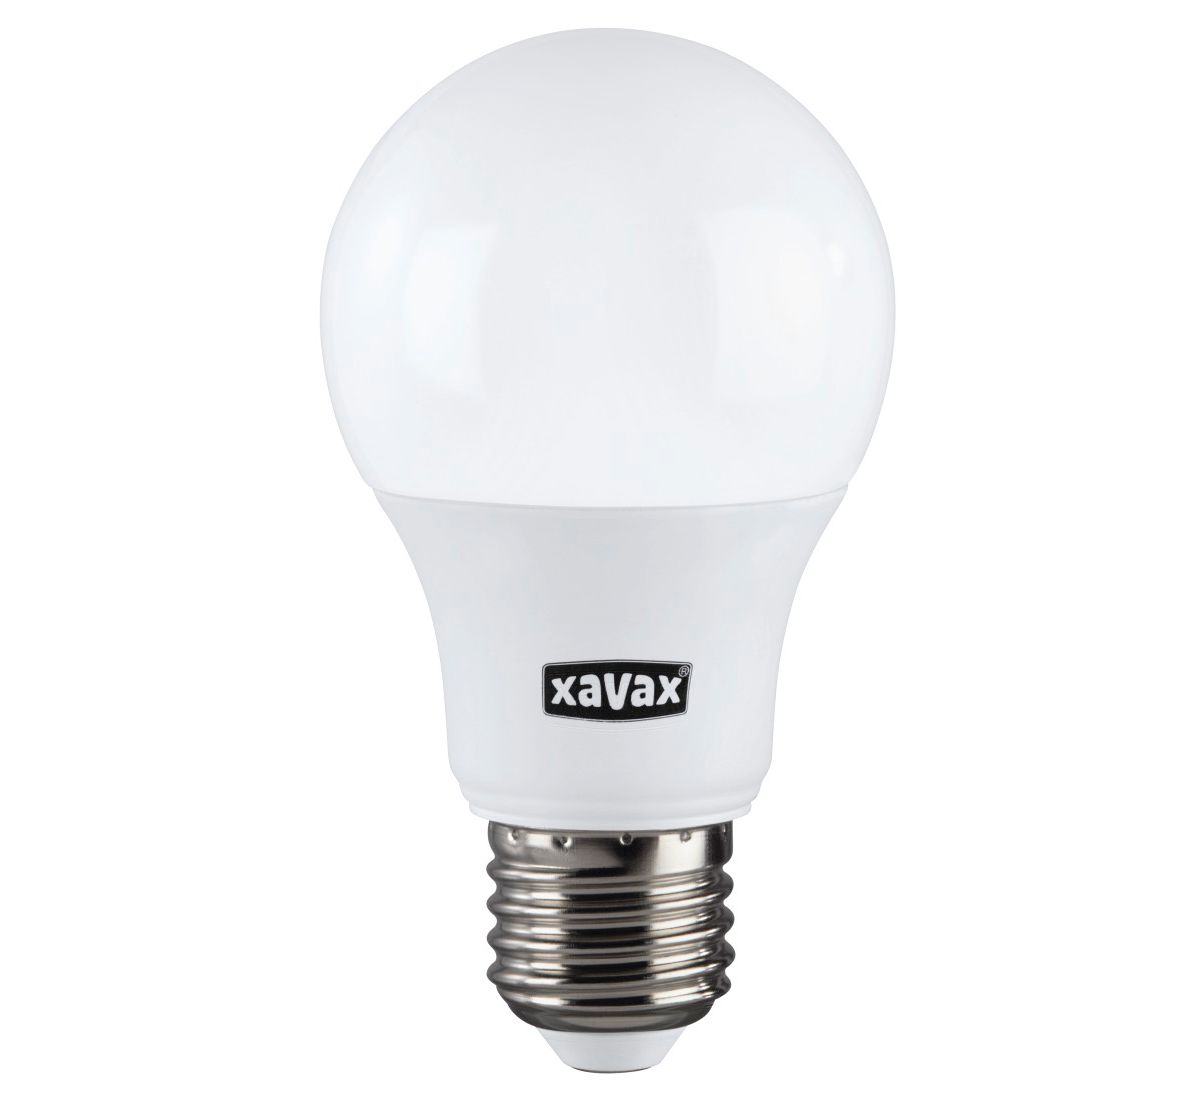 Xavax LED-Lampe, E27, 806lm ersetzt 60W, Glühla...